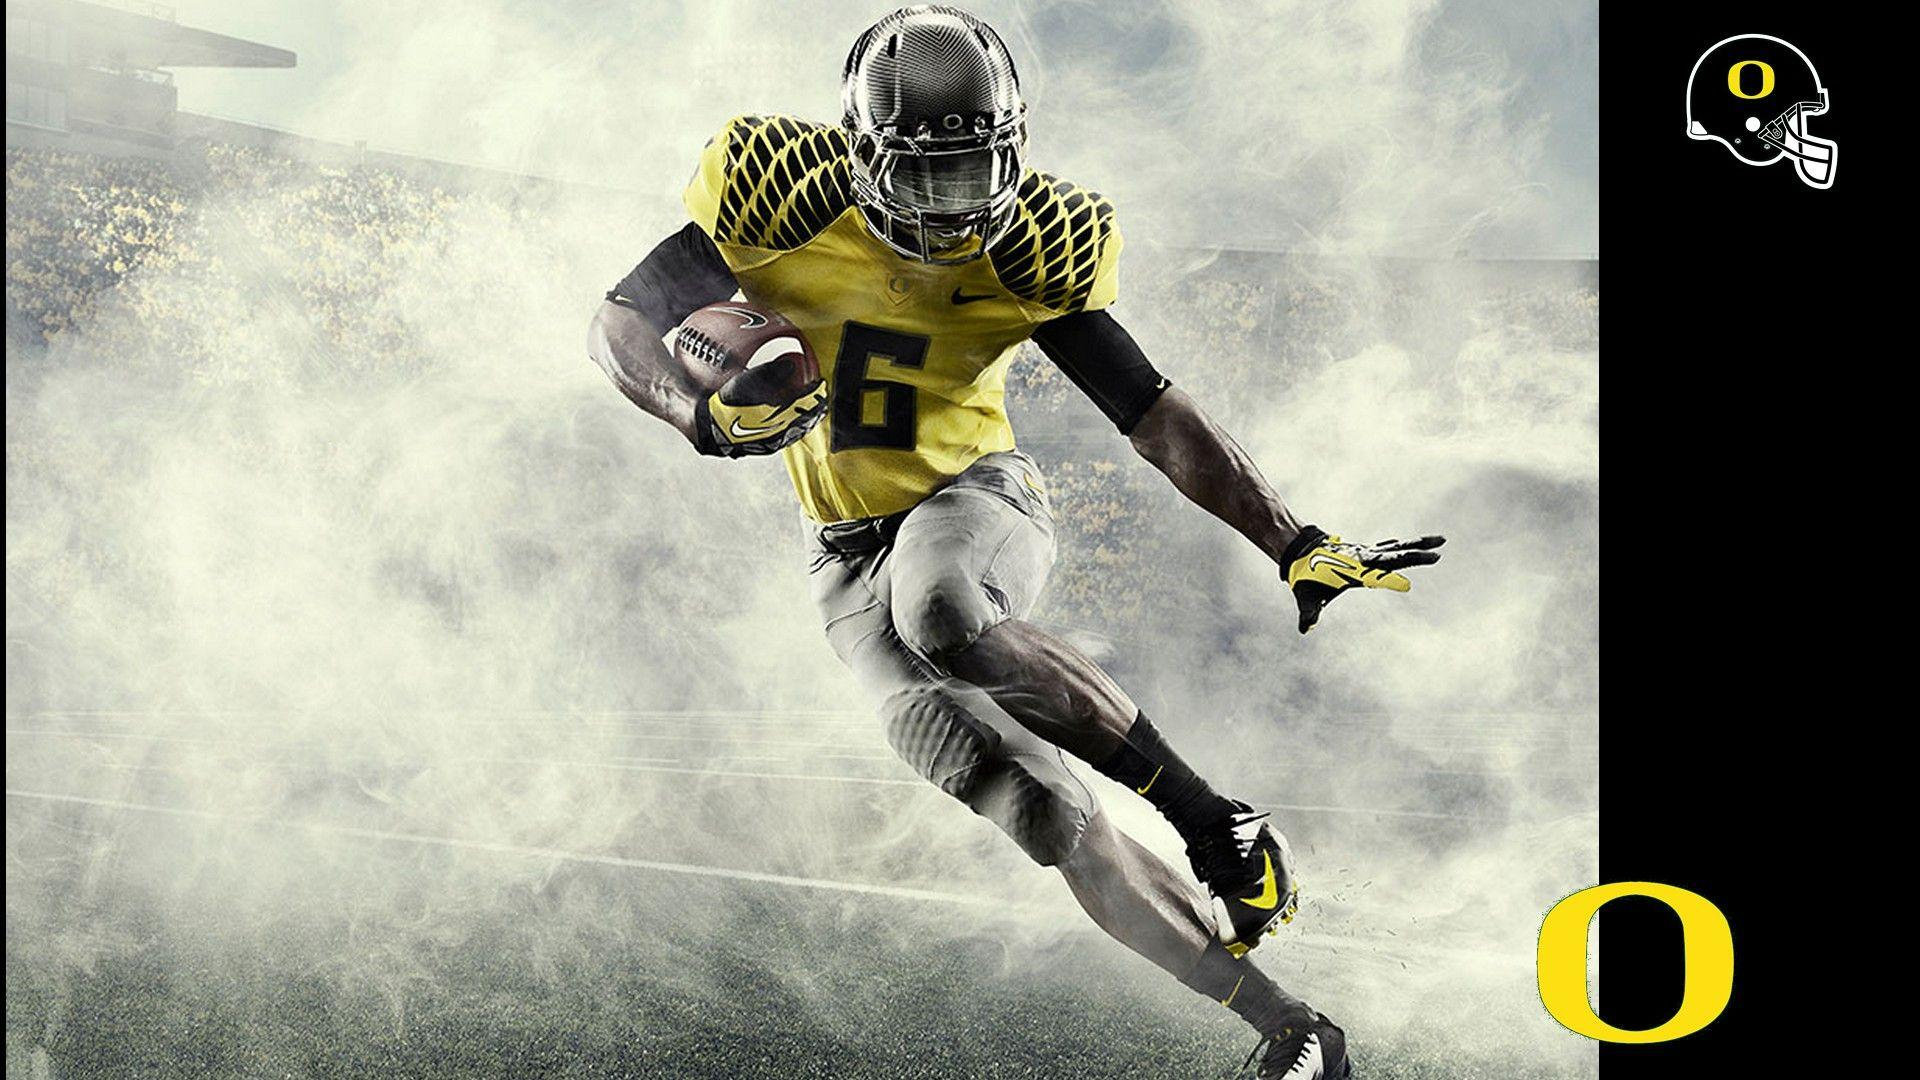 ESPN College Football Wallpapers